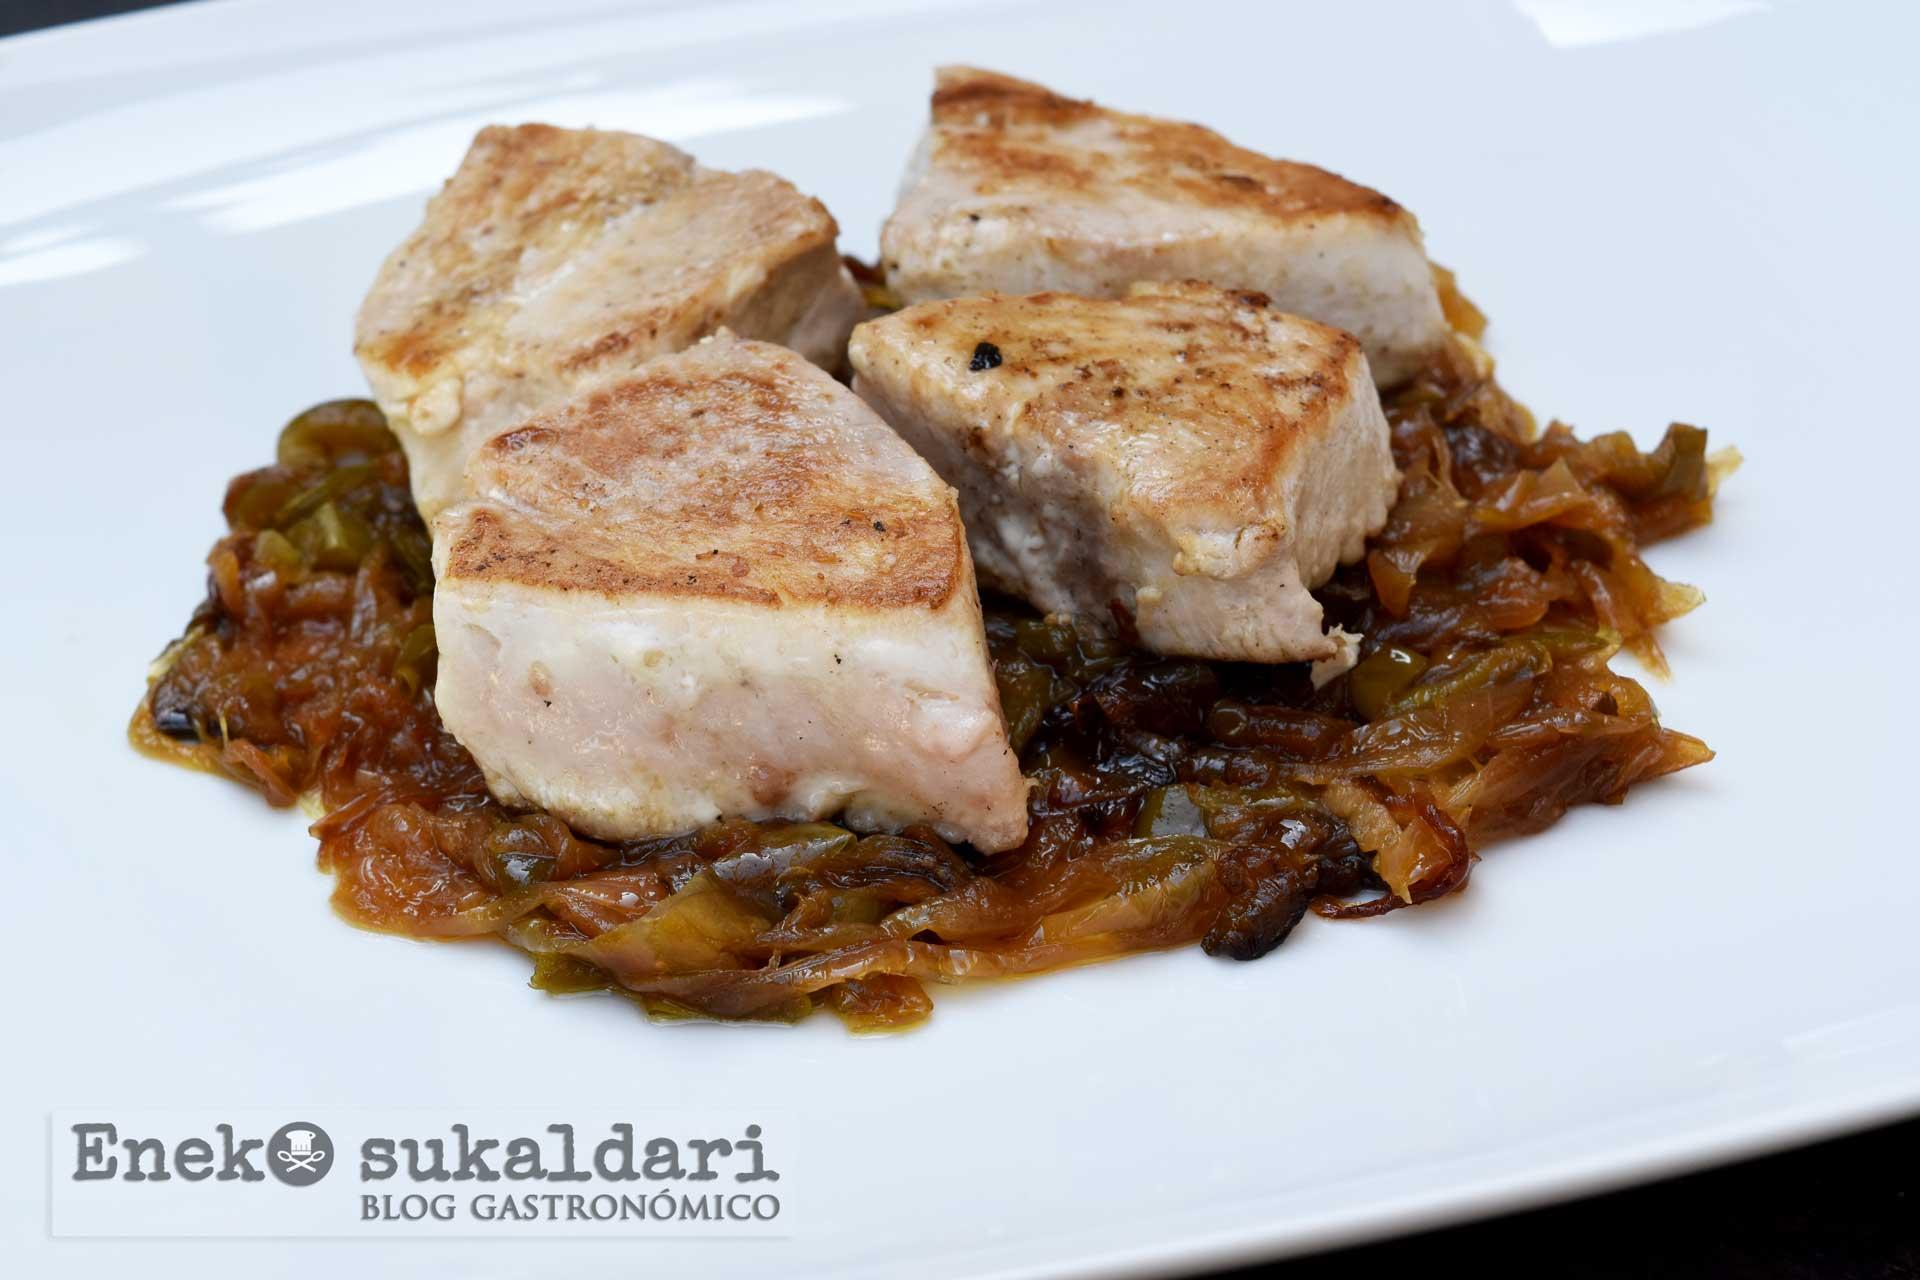 Bonito encebollado - receta - Eneko sukaldari